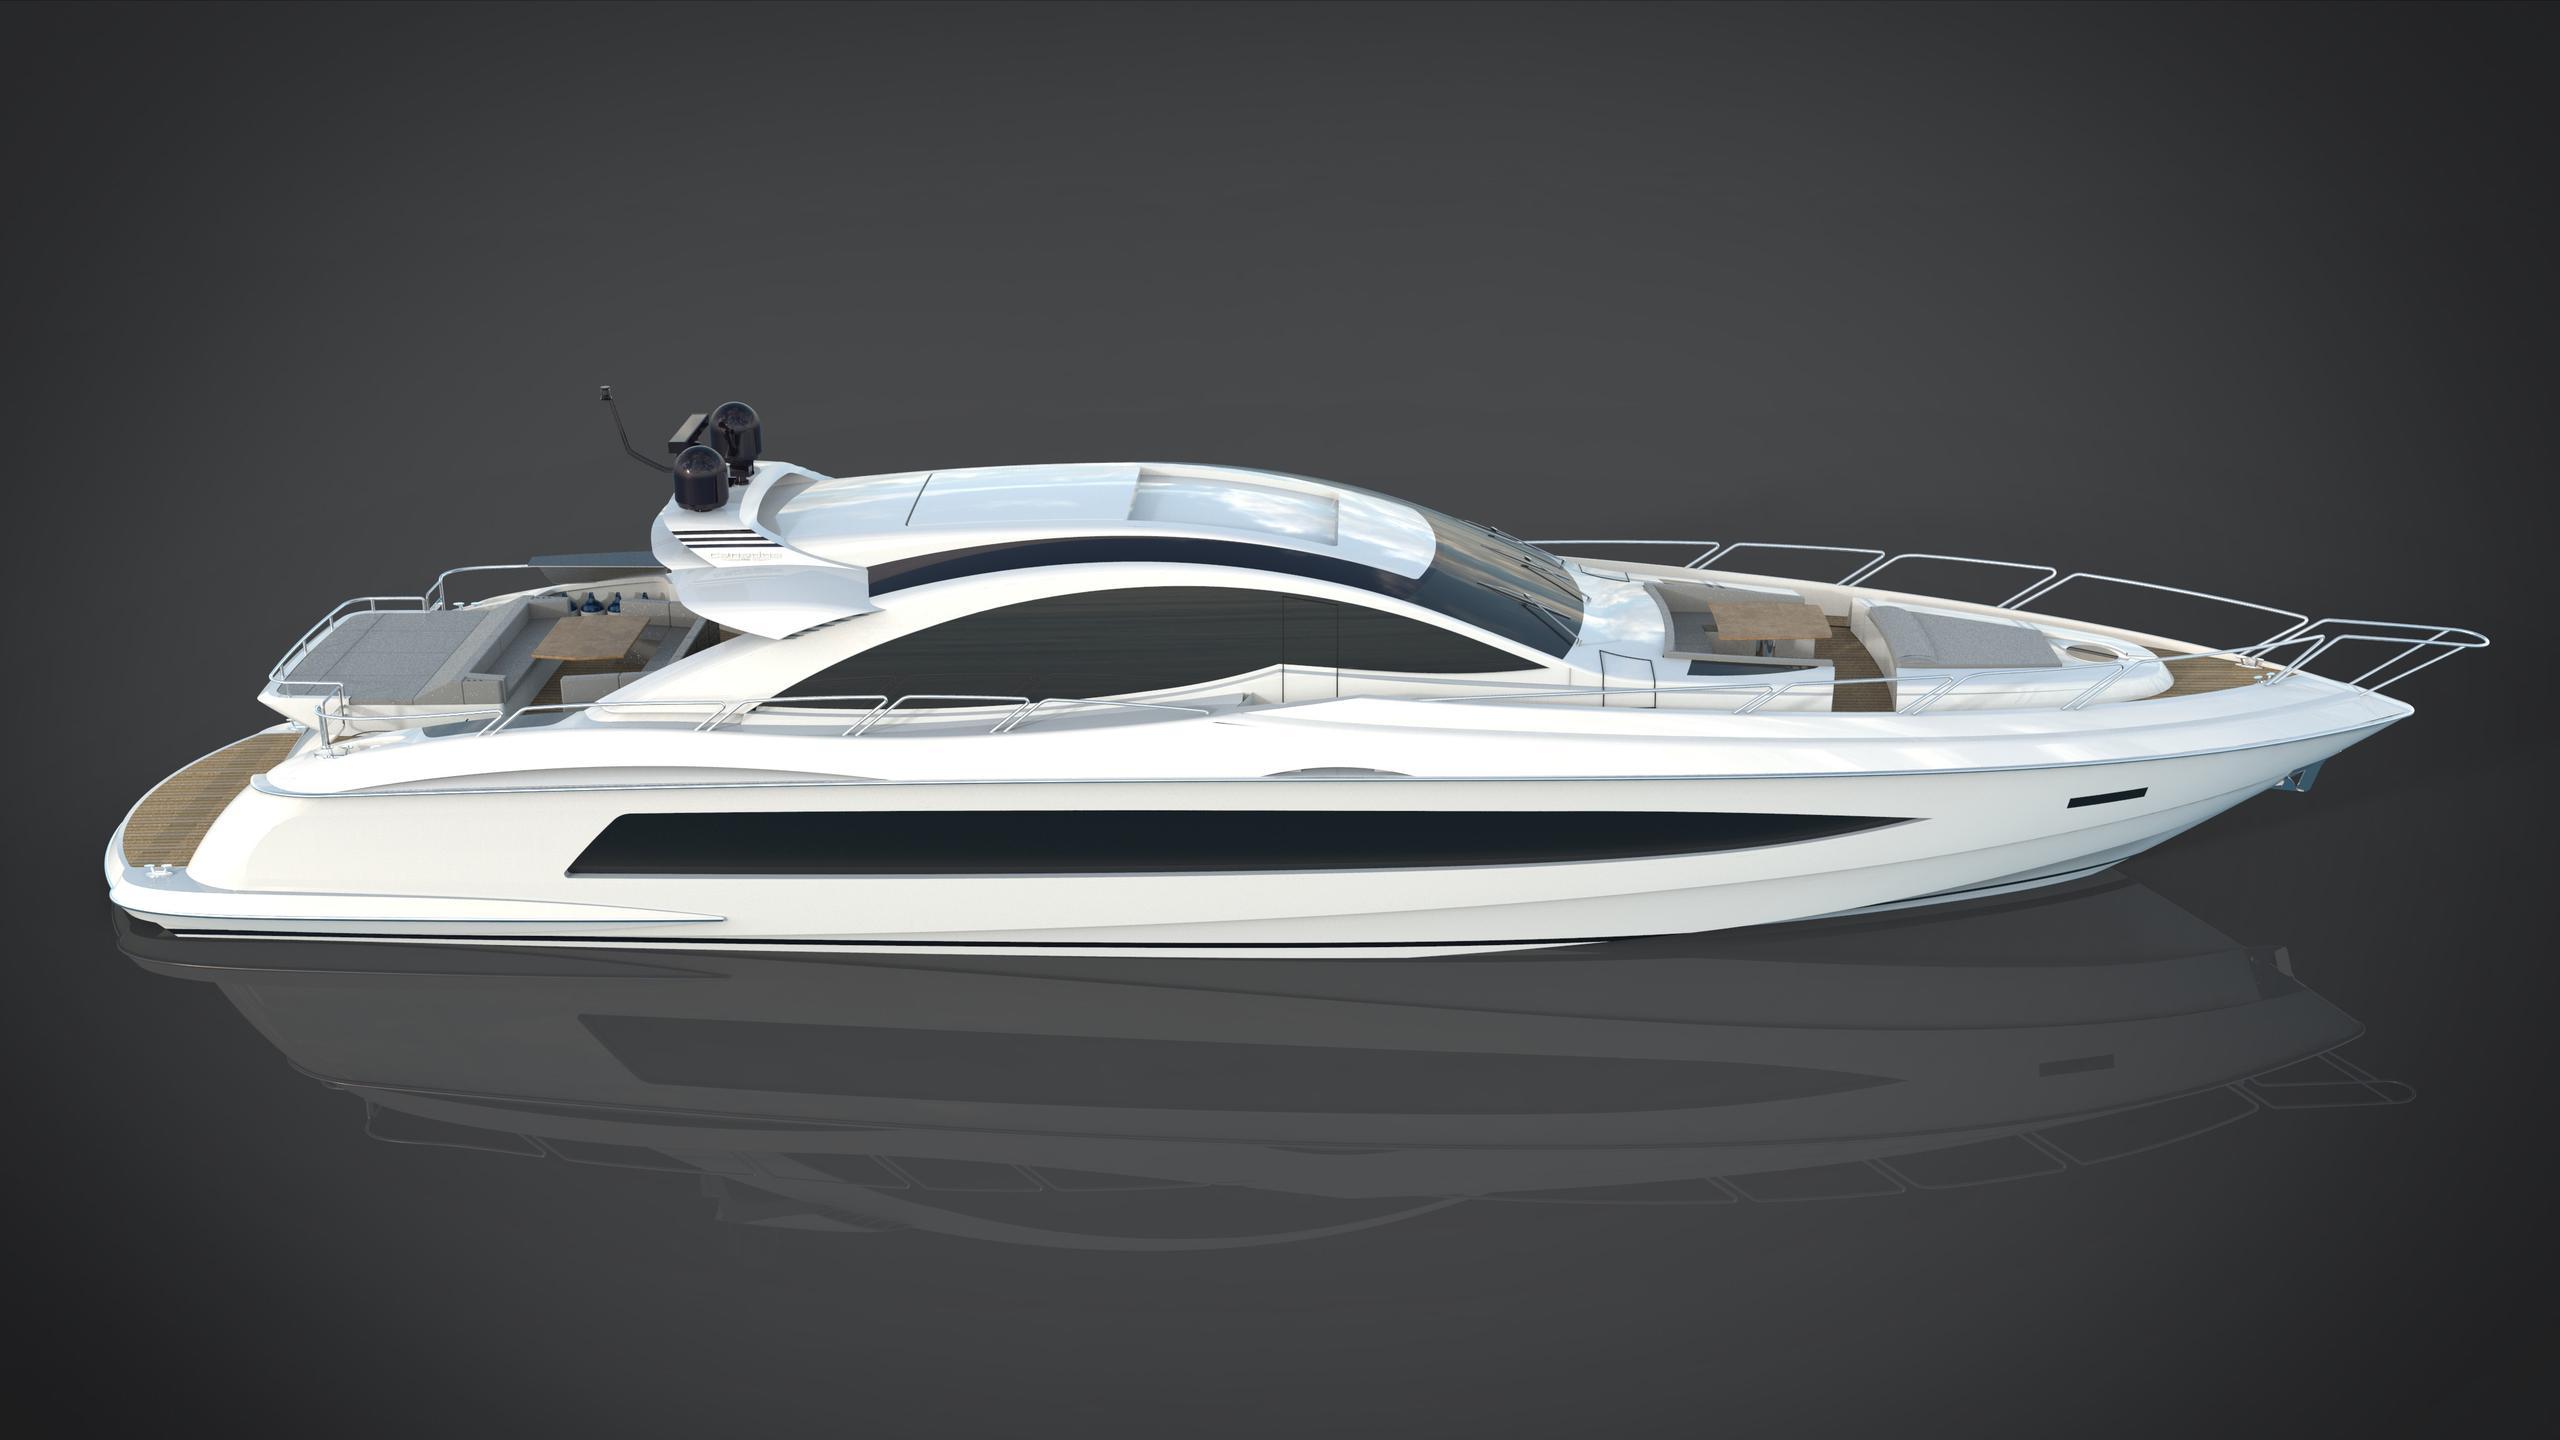 canados-90-gladiator-motoryacht-canados-2017-27m-profile-rendering